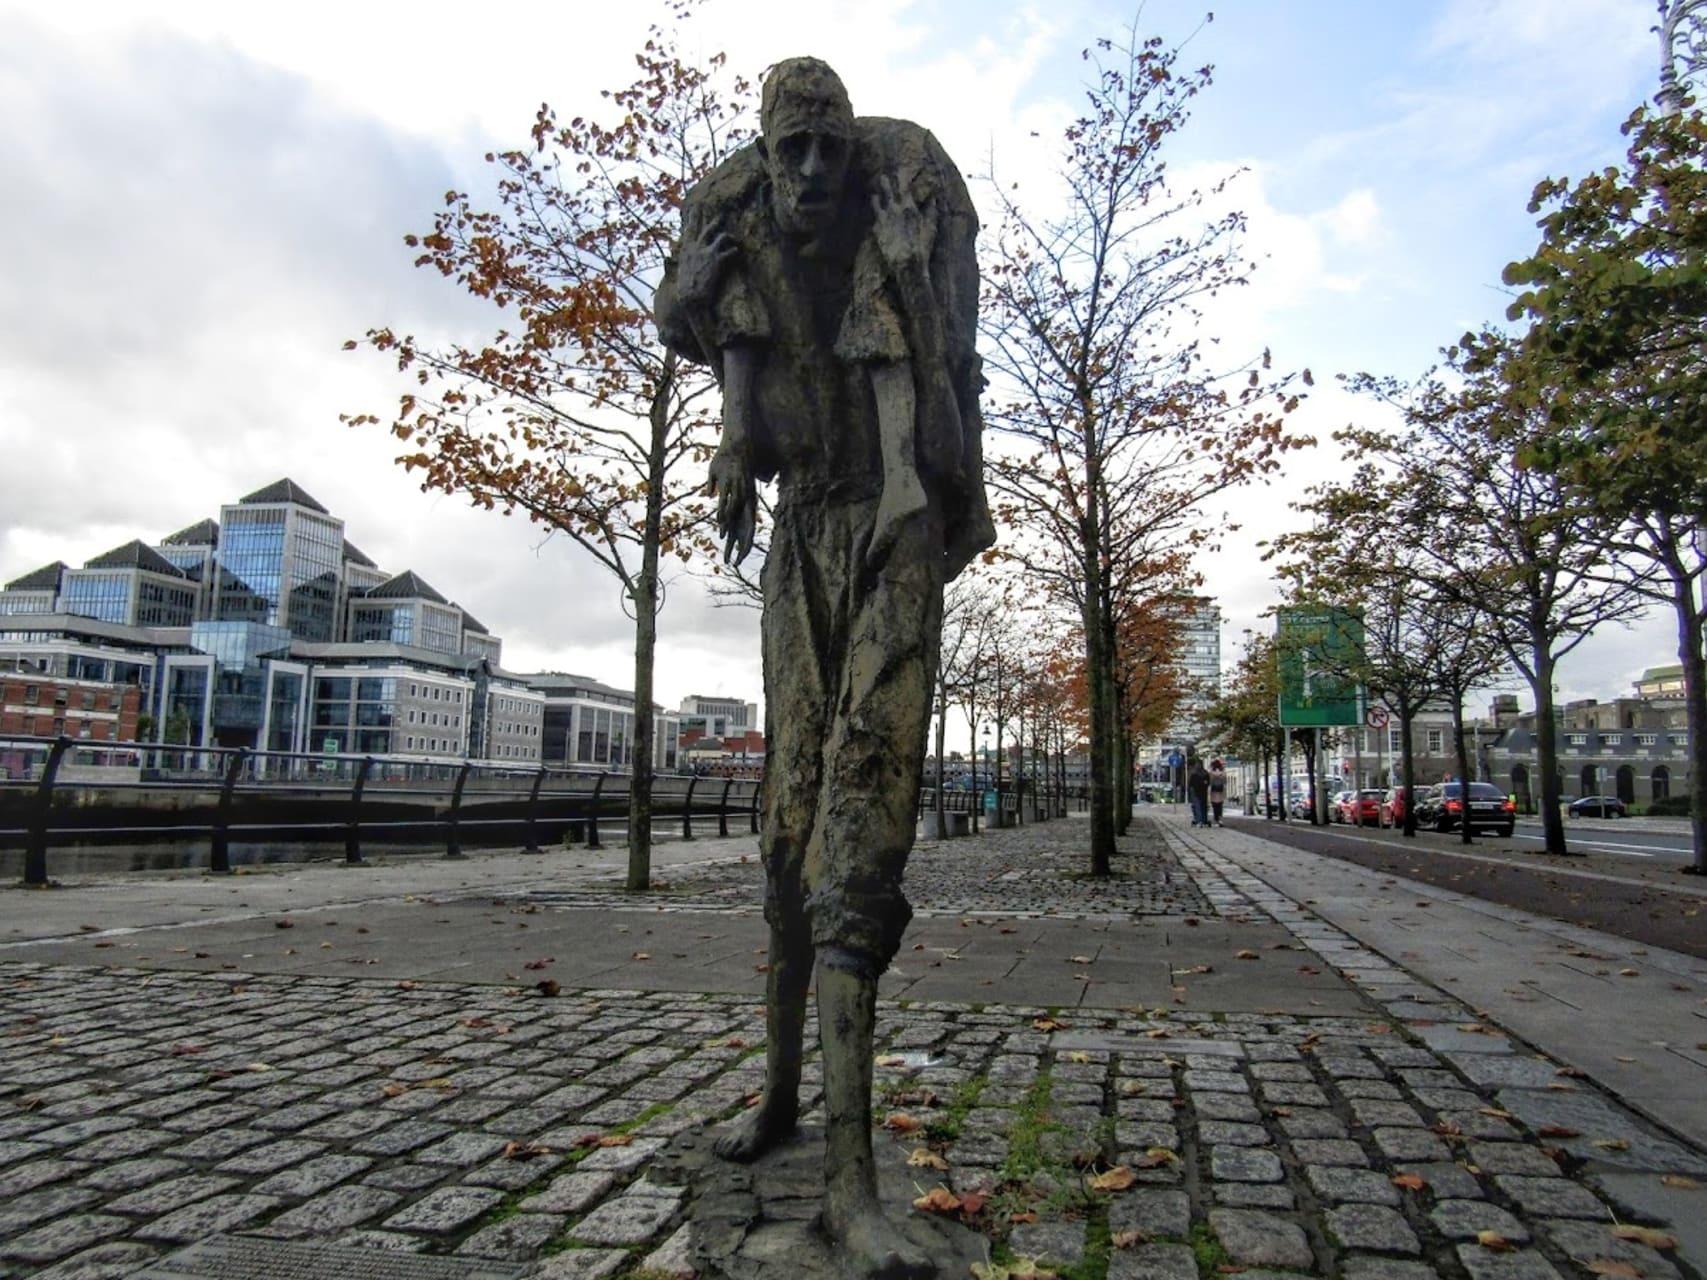 Dublin - An Gorta Mór: The story of Ireland's Great Hunger